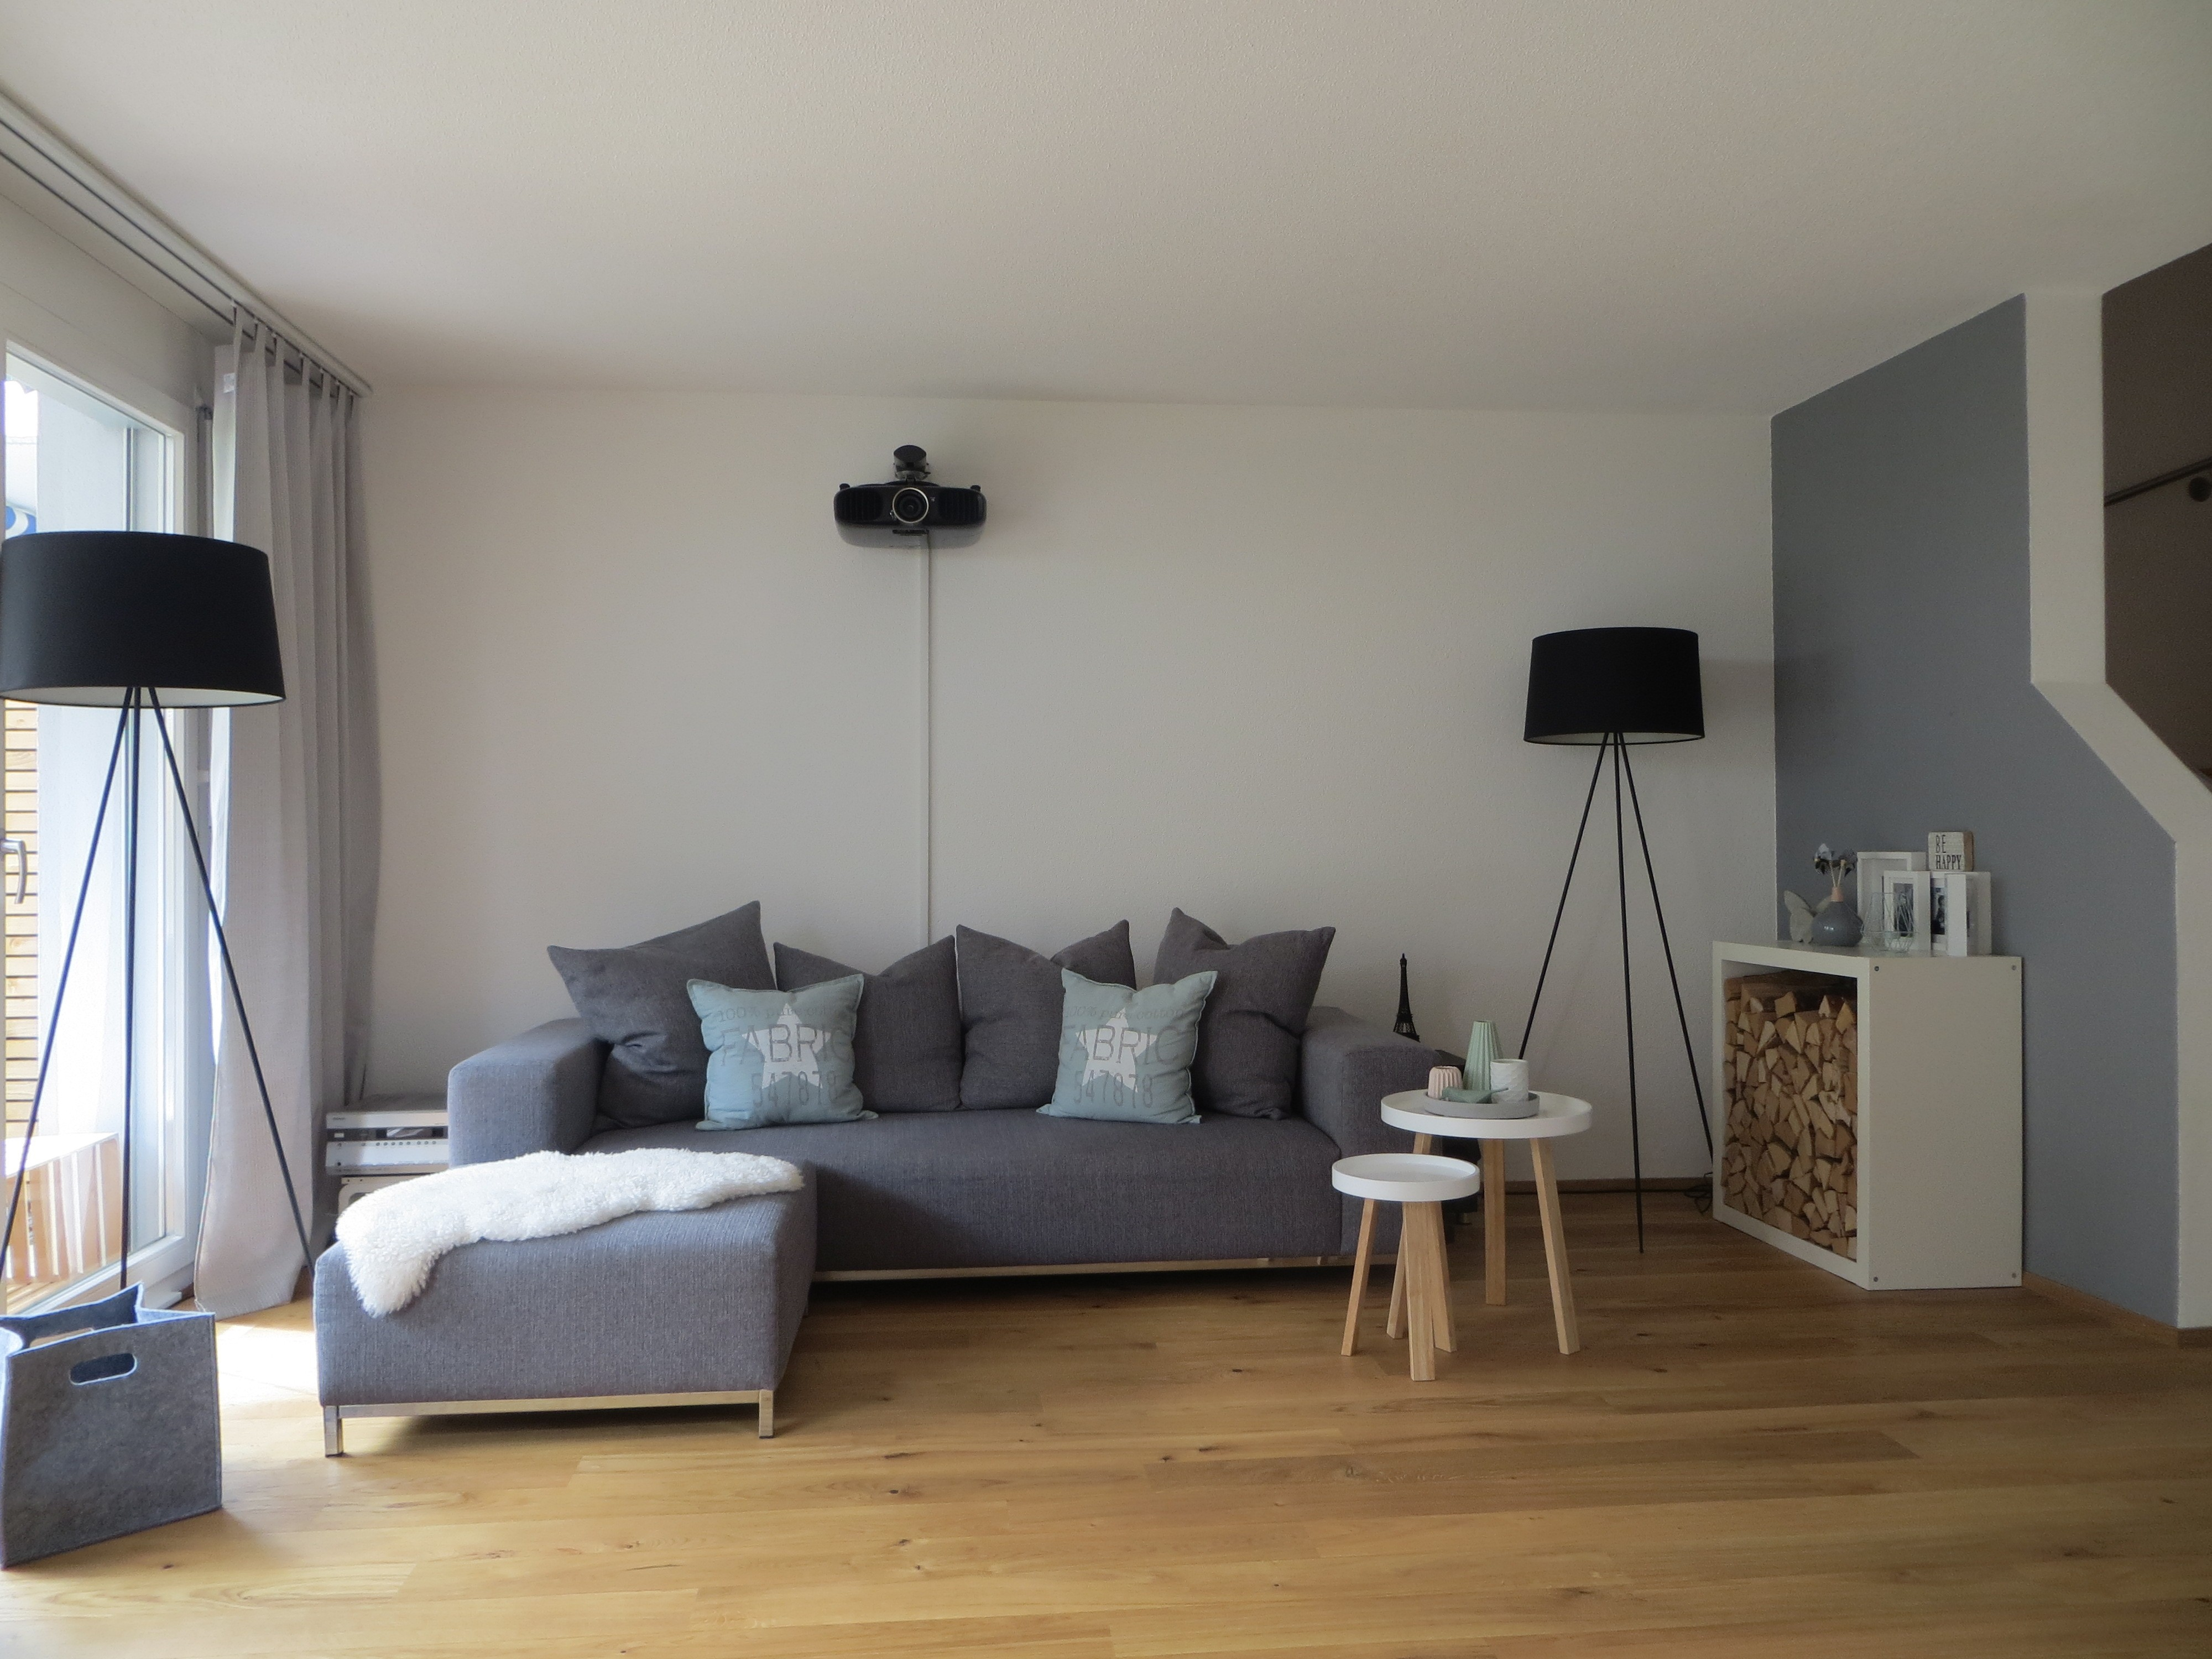 img 3632 freiraum7 interior design. Black Bedroom Furniture Sets. Home Design Ideas